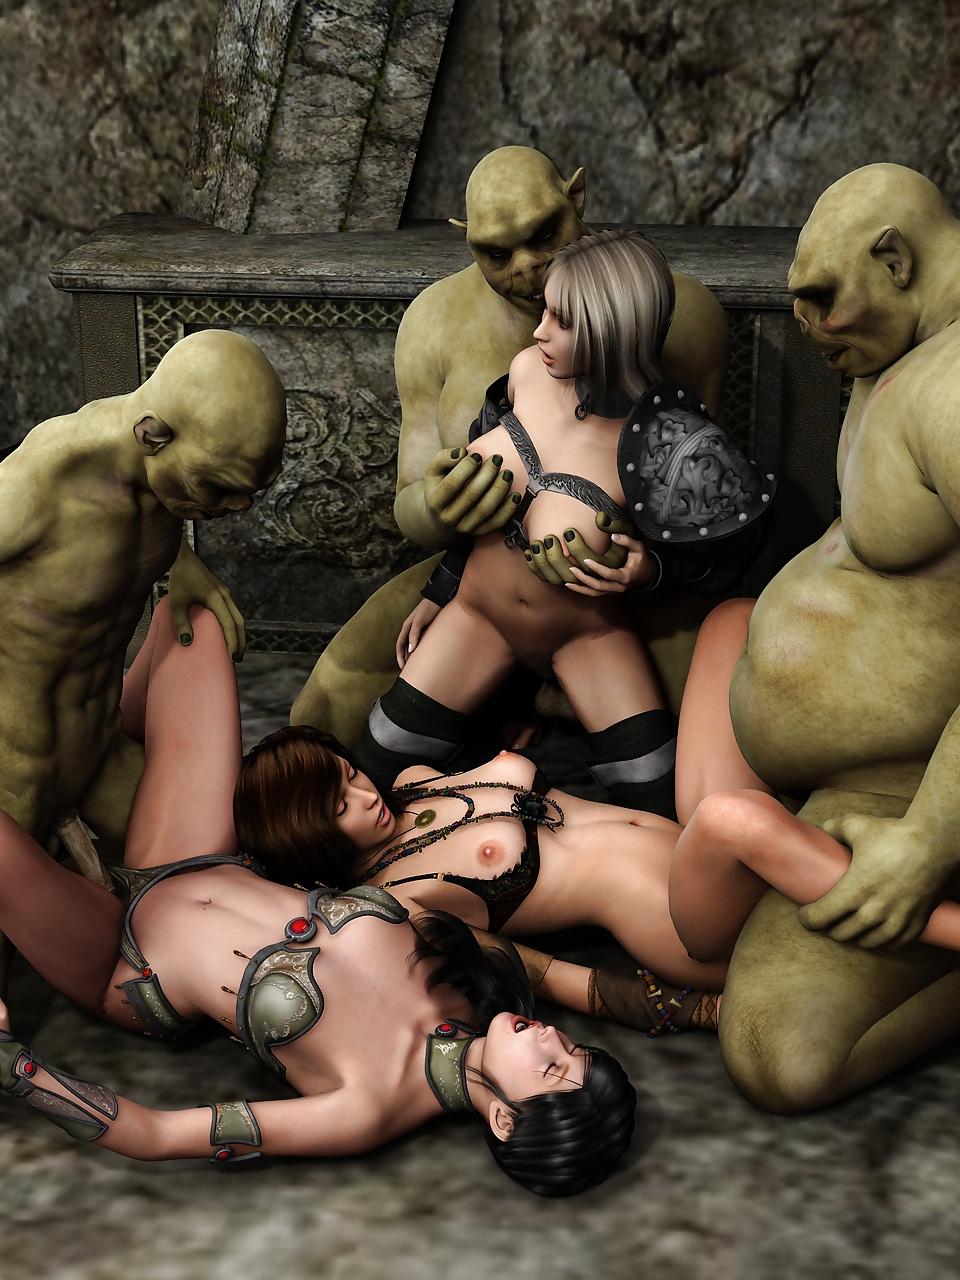 Cartoon Monster Porn - 40 Pics  Xhamster-6084